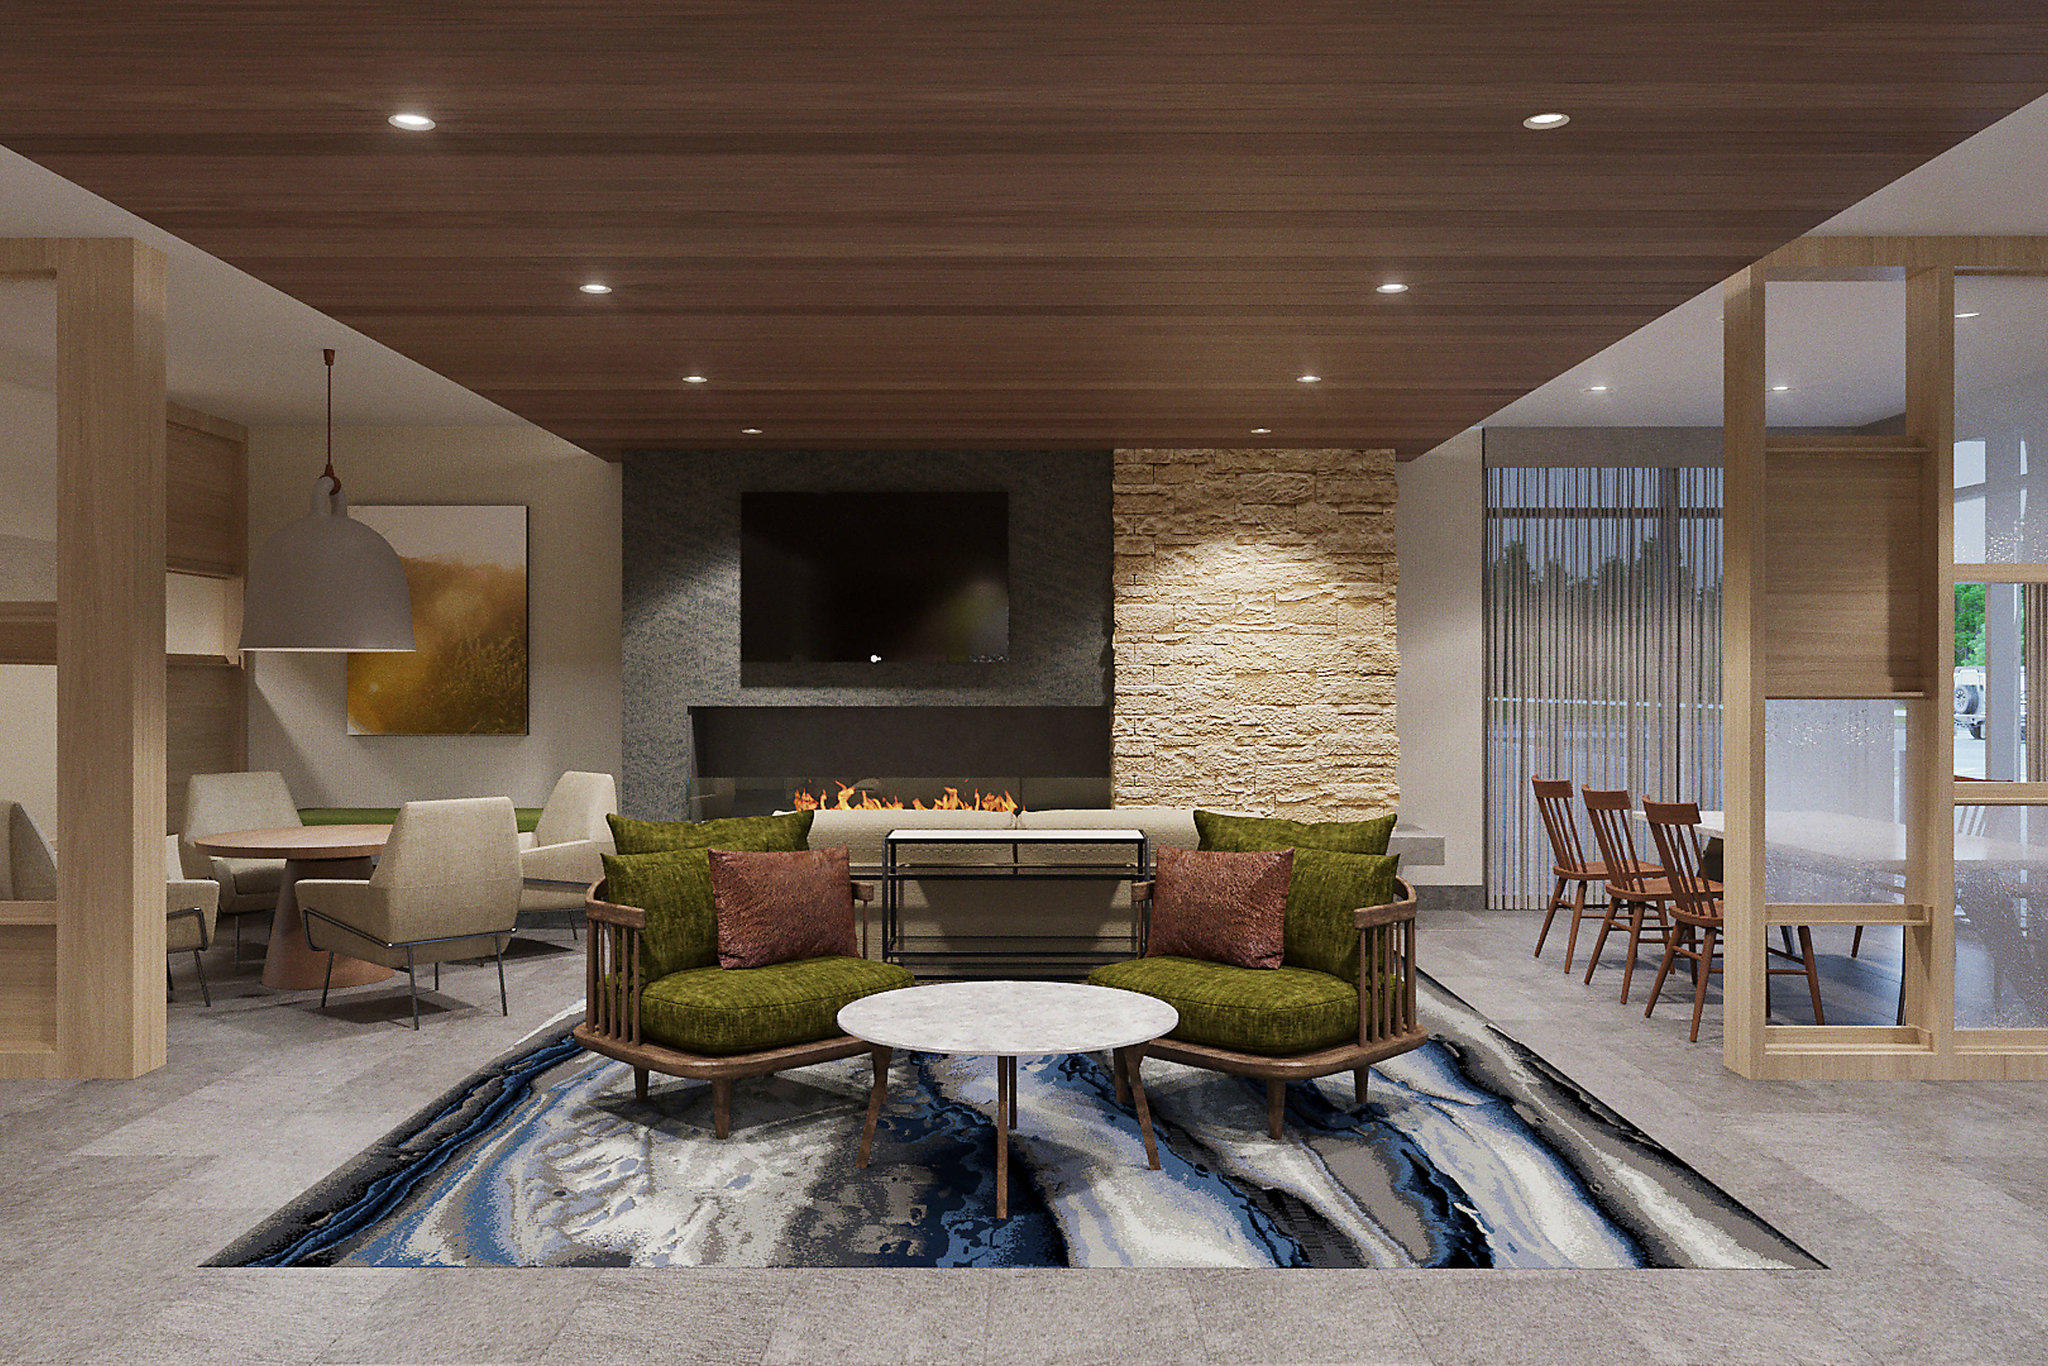 Fairfield Inn & Suites by Marriott Kansas City Shawnee